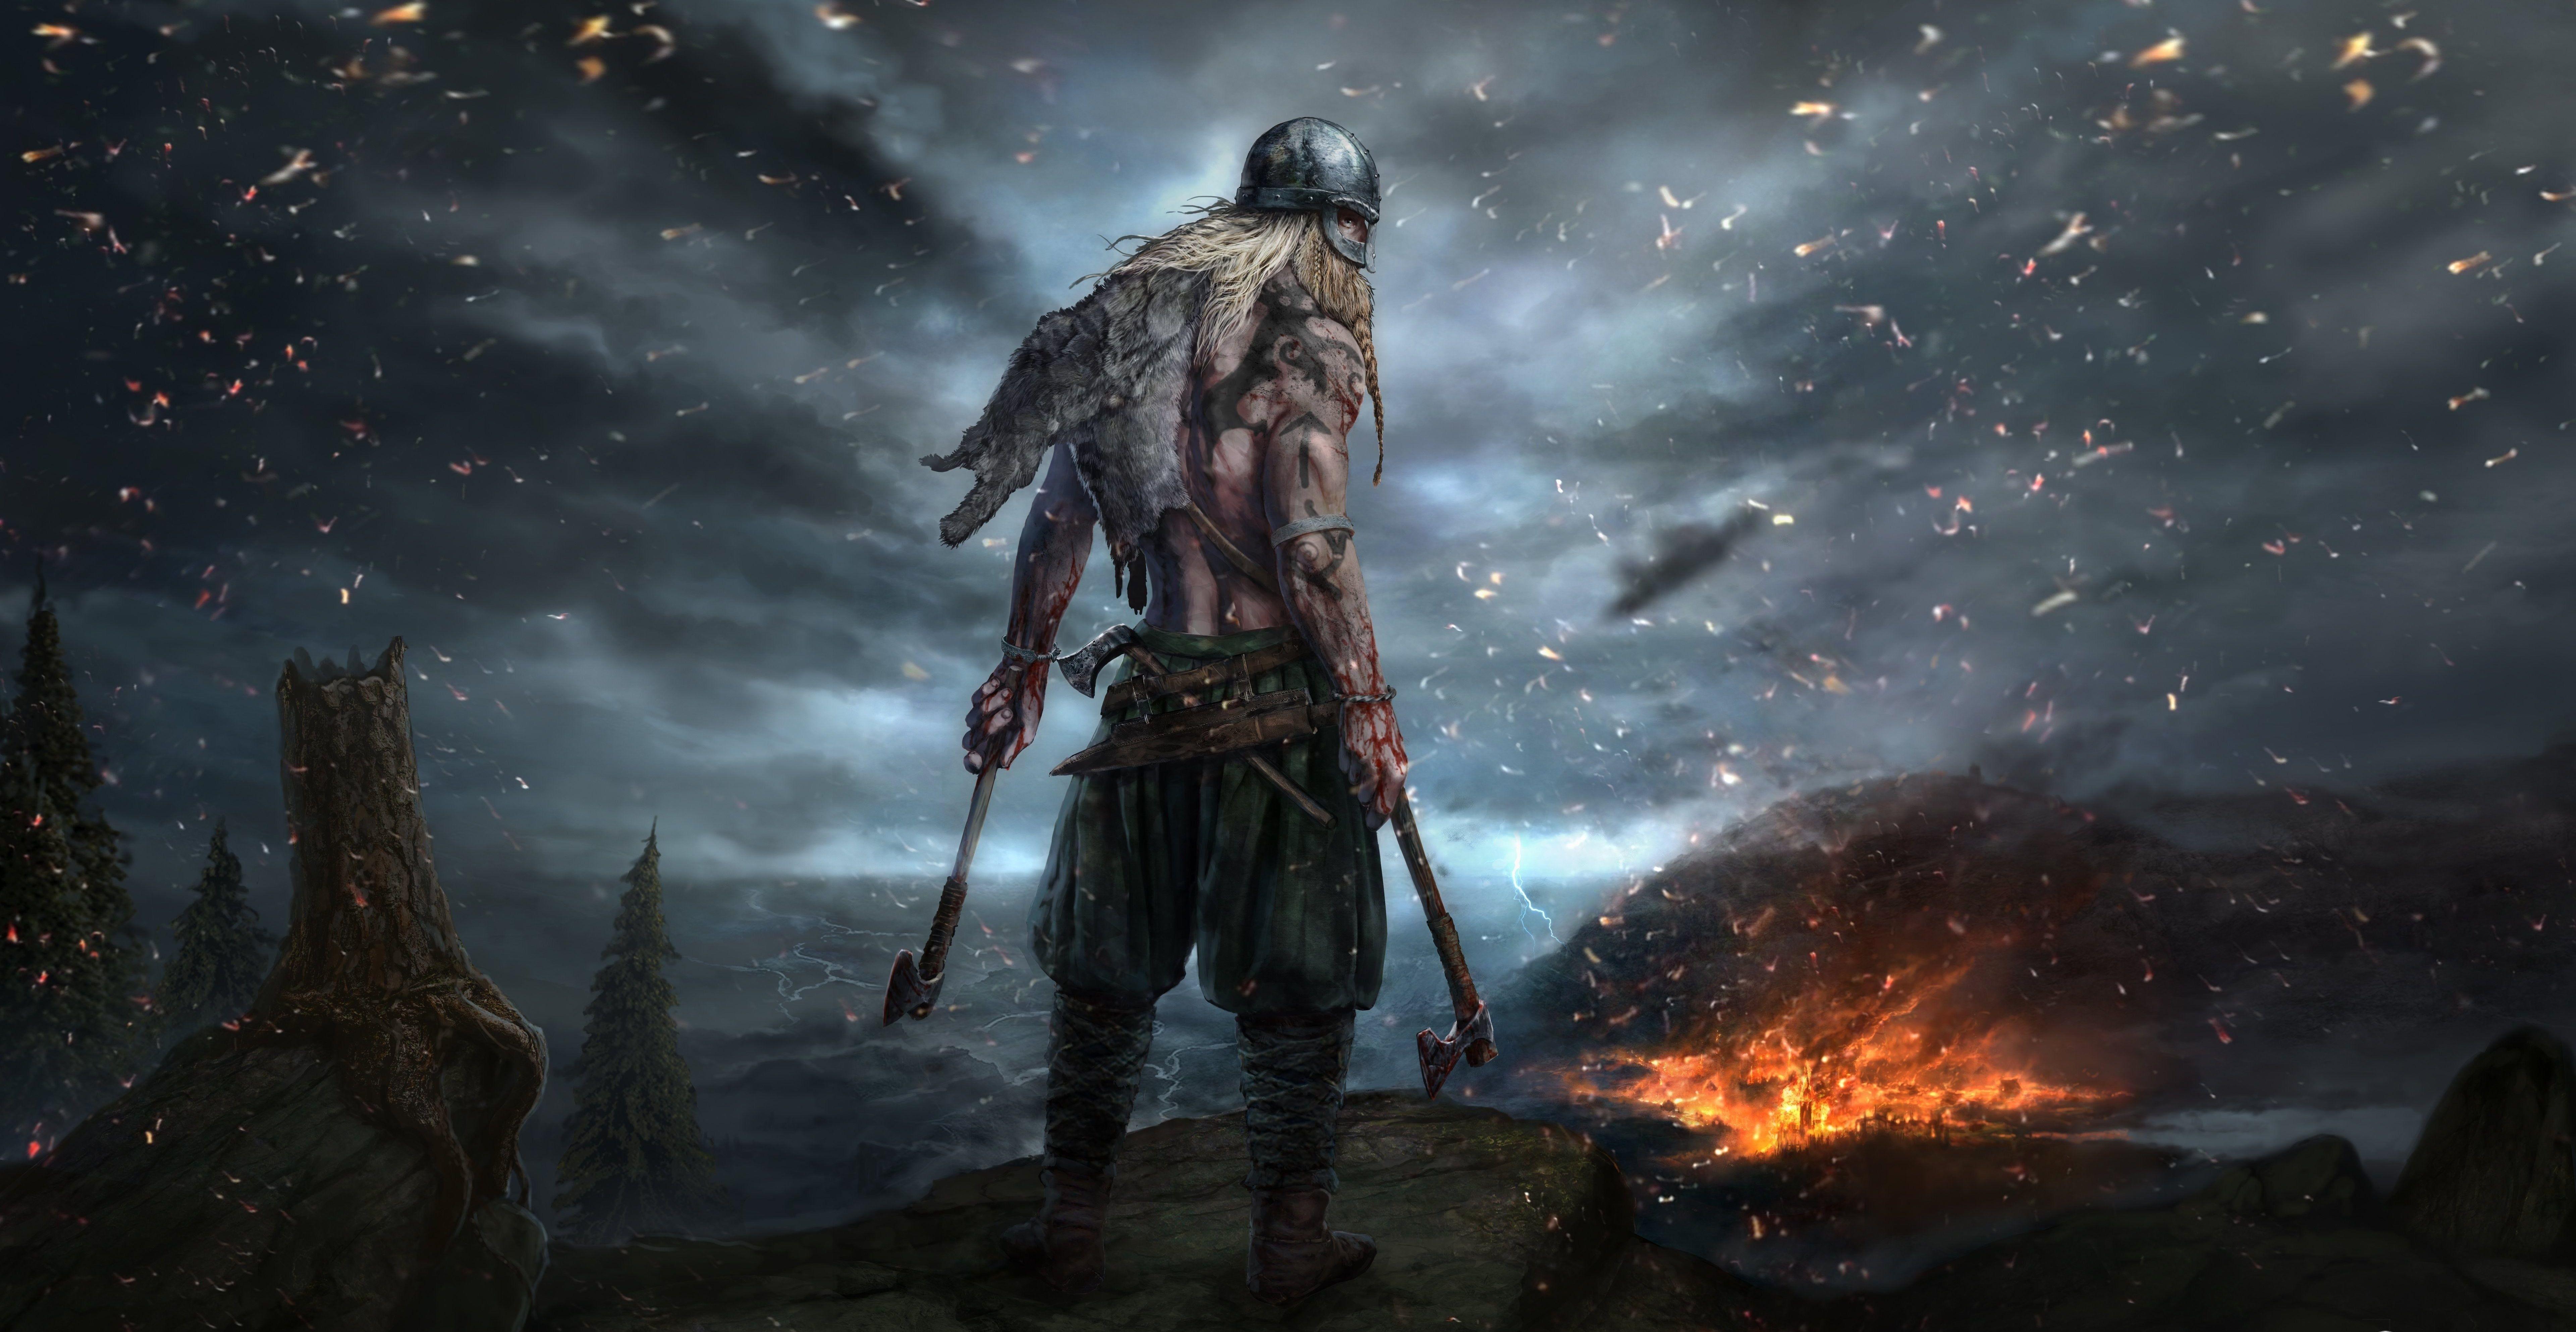 8k Gaming Wallpapers Top Free 8k Gaming Backgrounds Wallpaperaccess